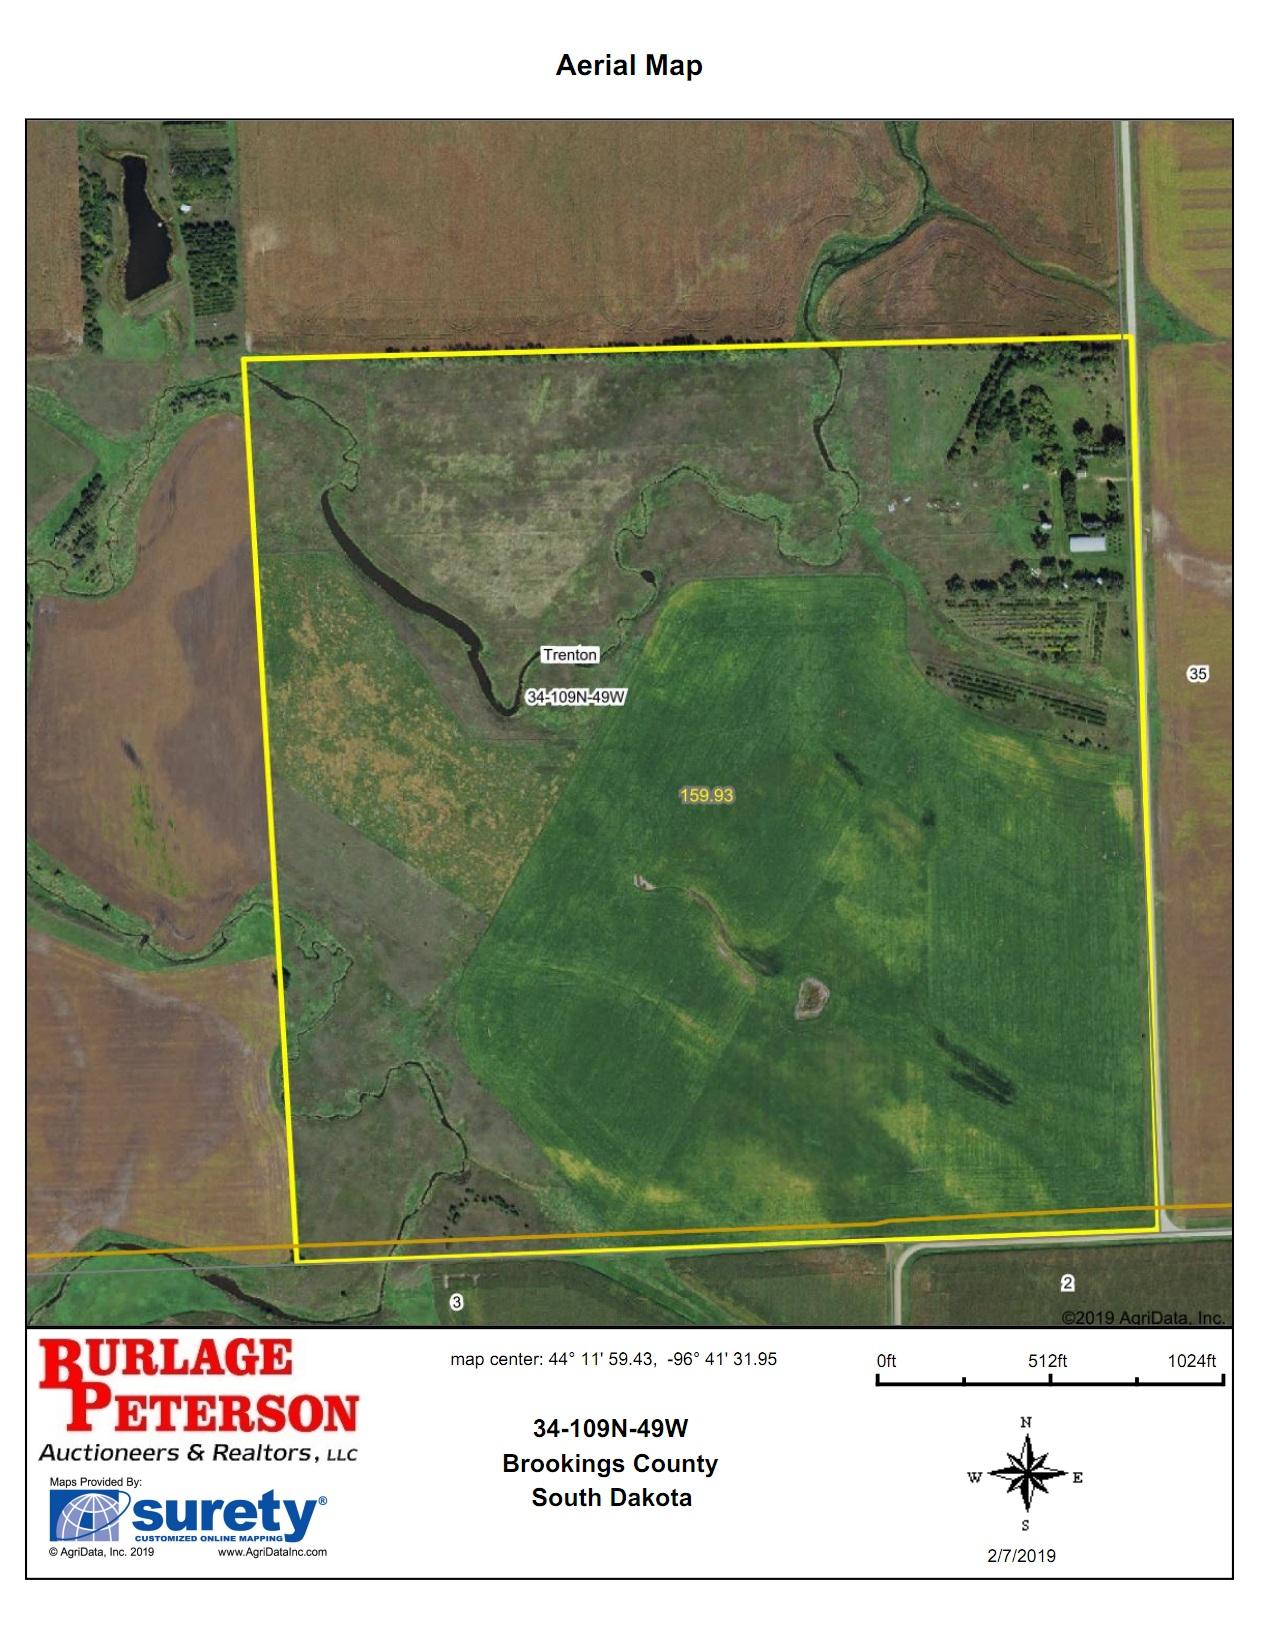 Short Farm Aerial Map JPEG.jpg